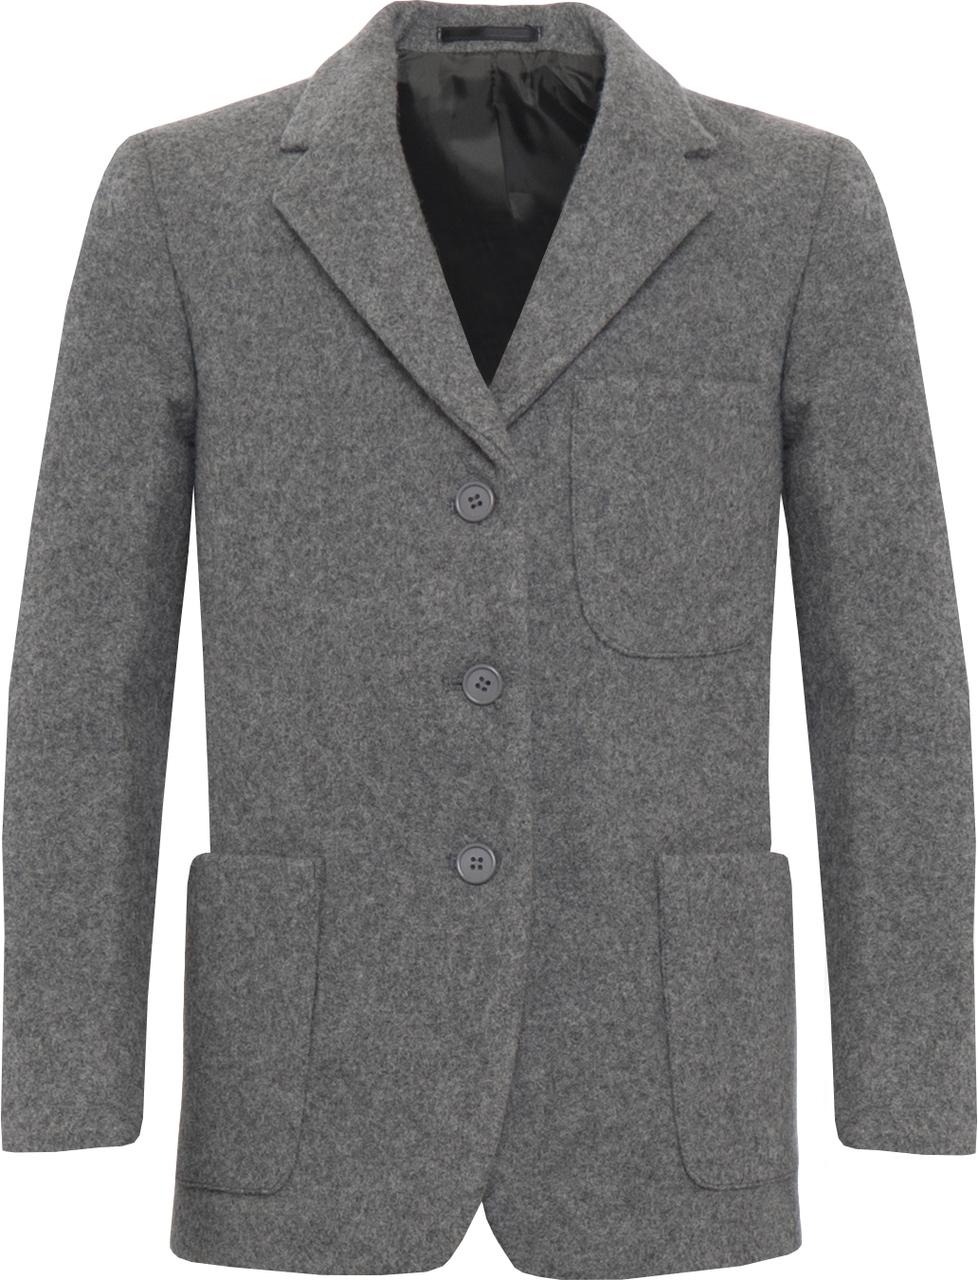 Grey Wool Blazer (Girls)